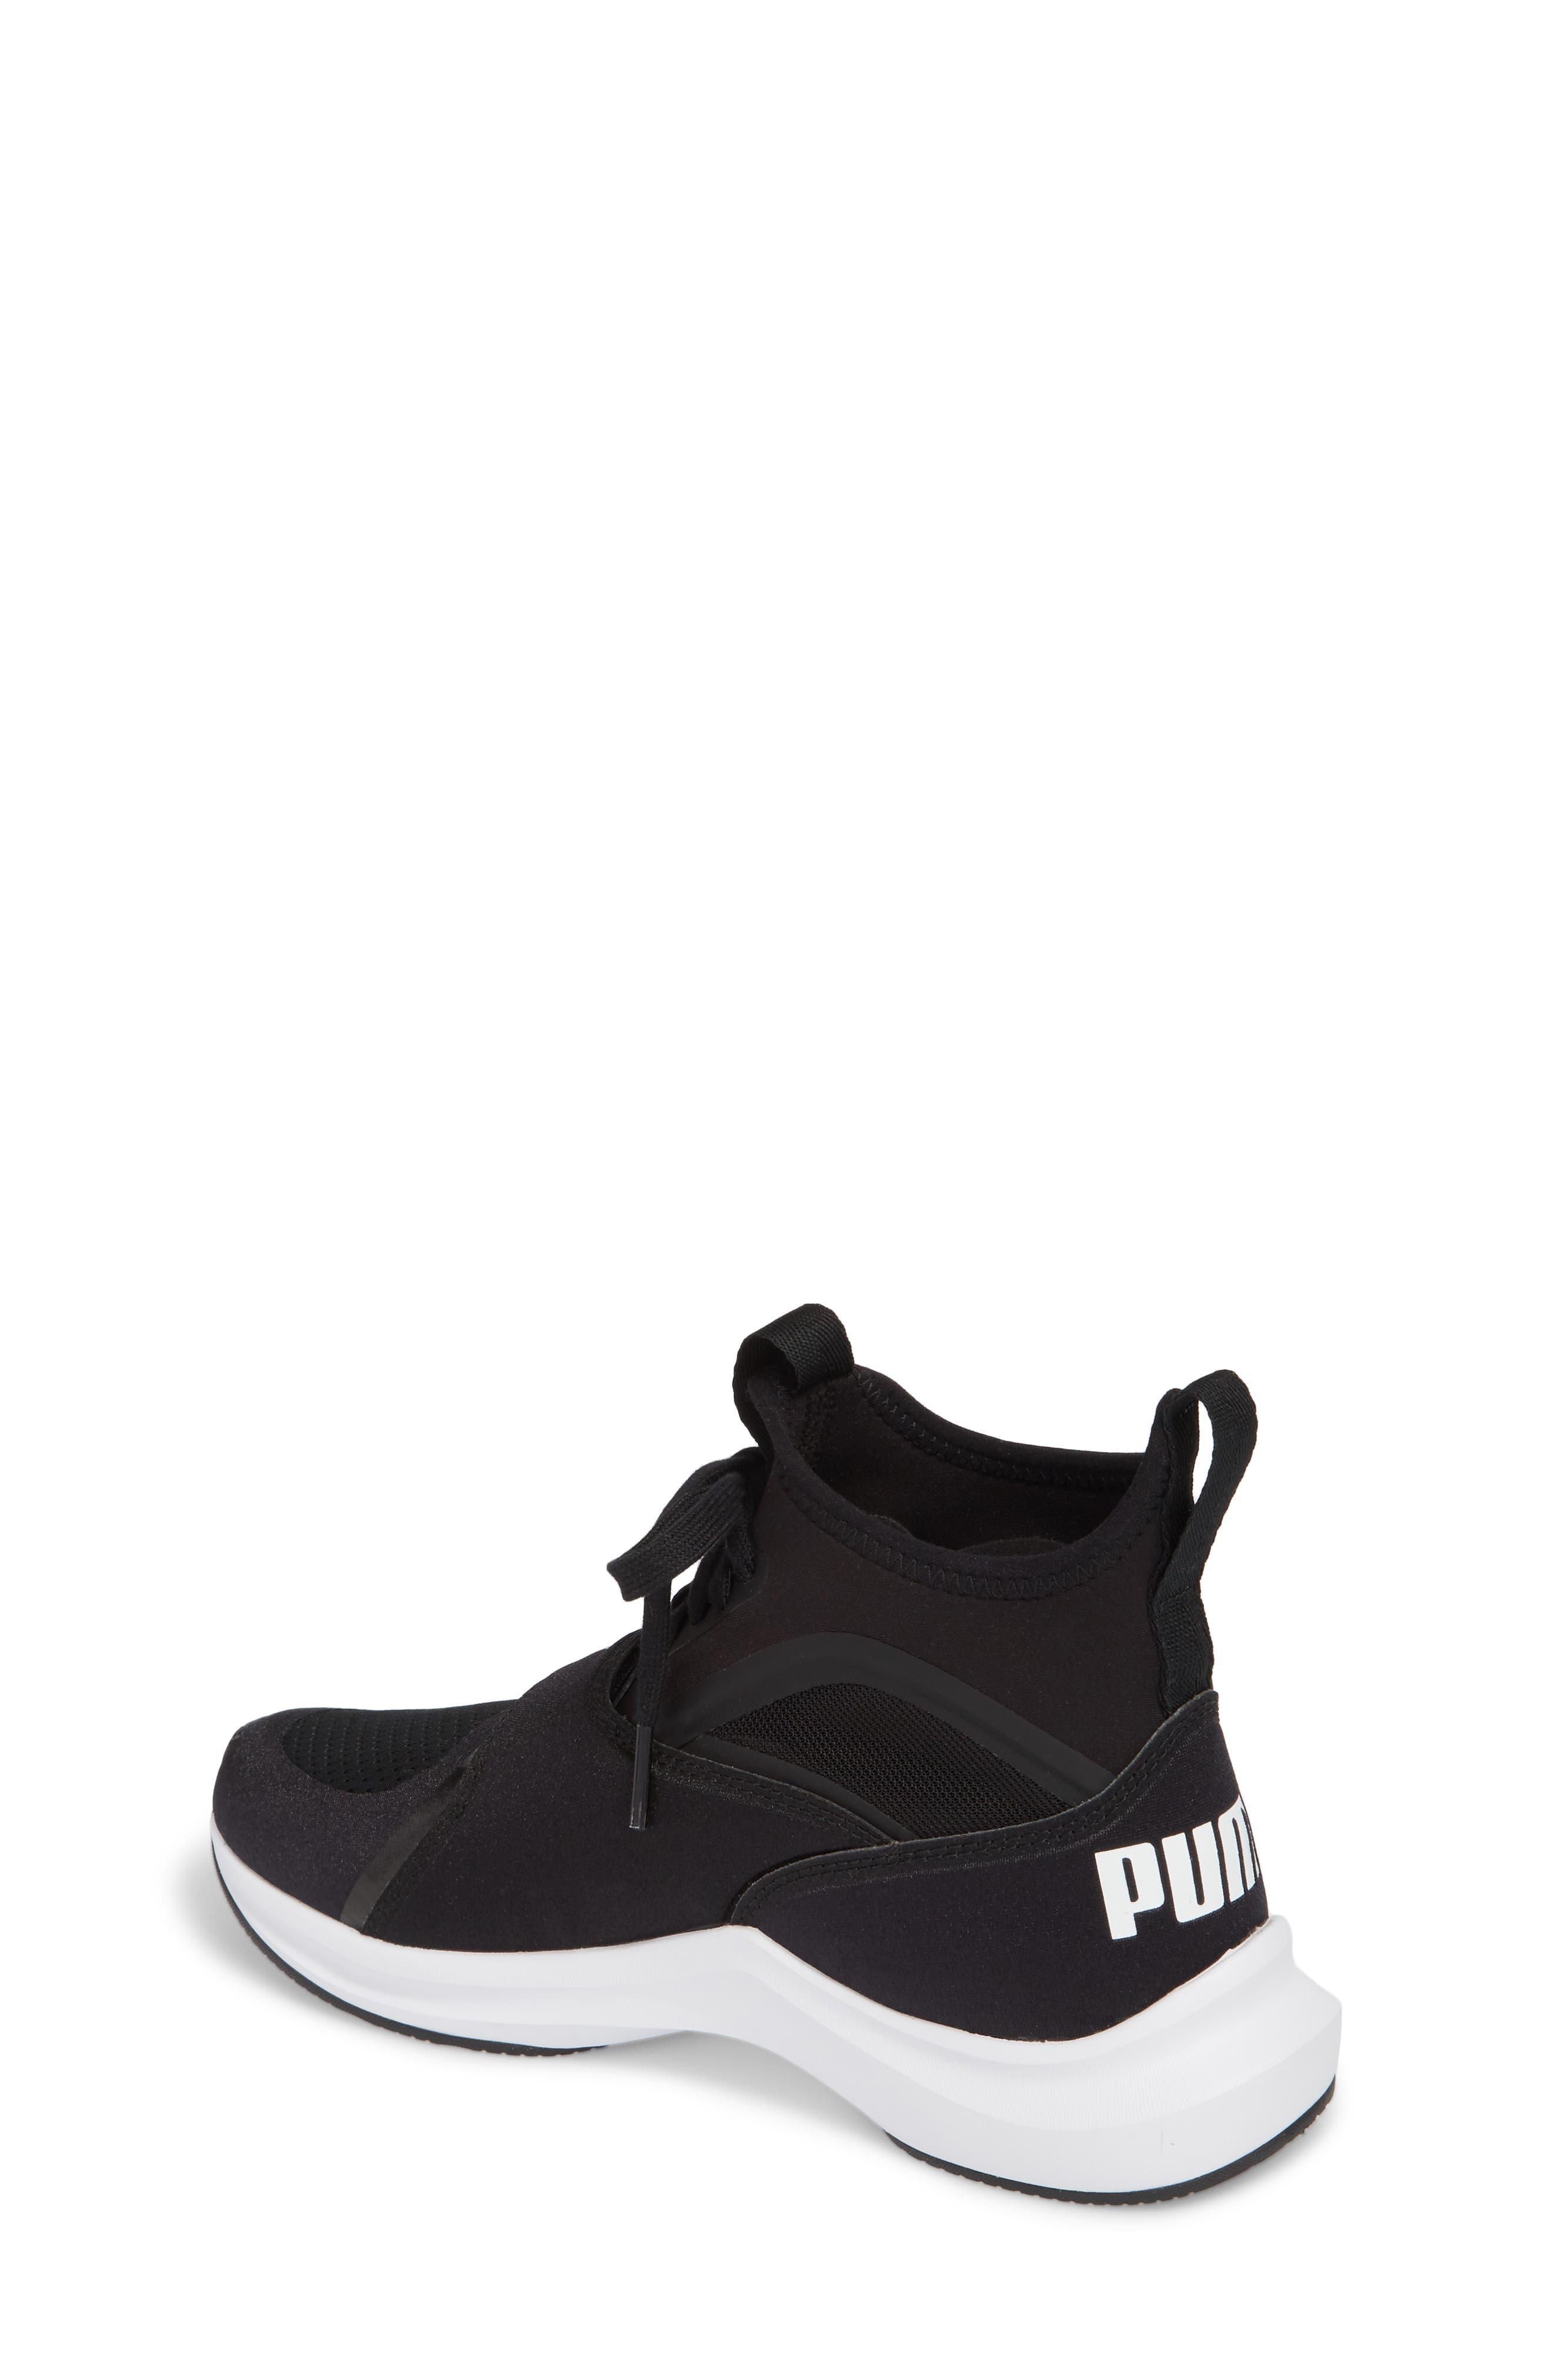 Phenom Jr High Top Sneaker,                             Alternate thumbnail 2, color,                             Puma Black/ Puma White